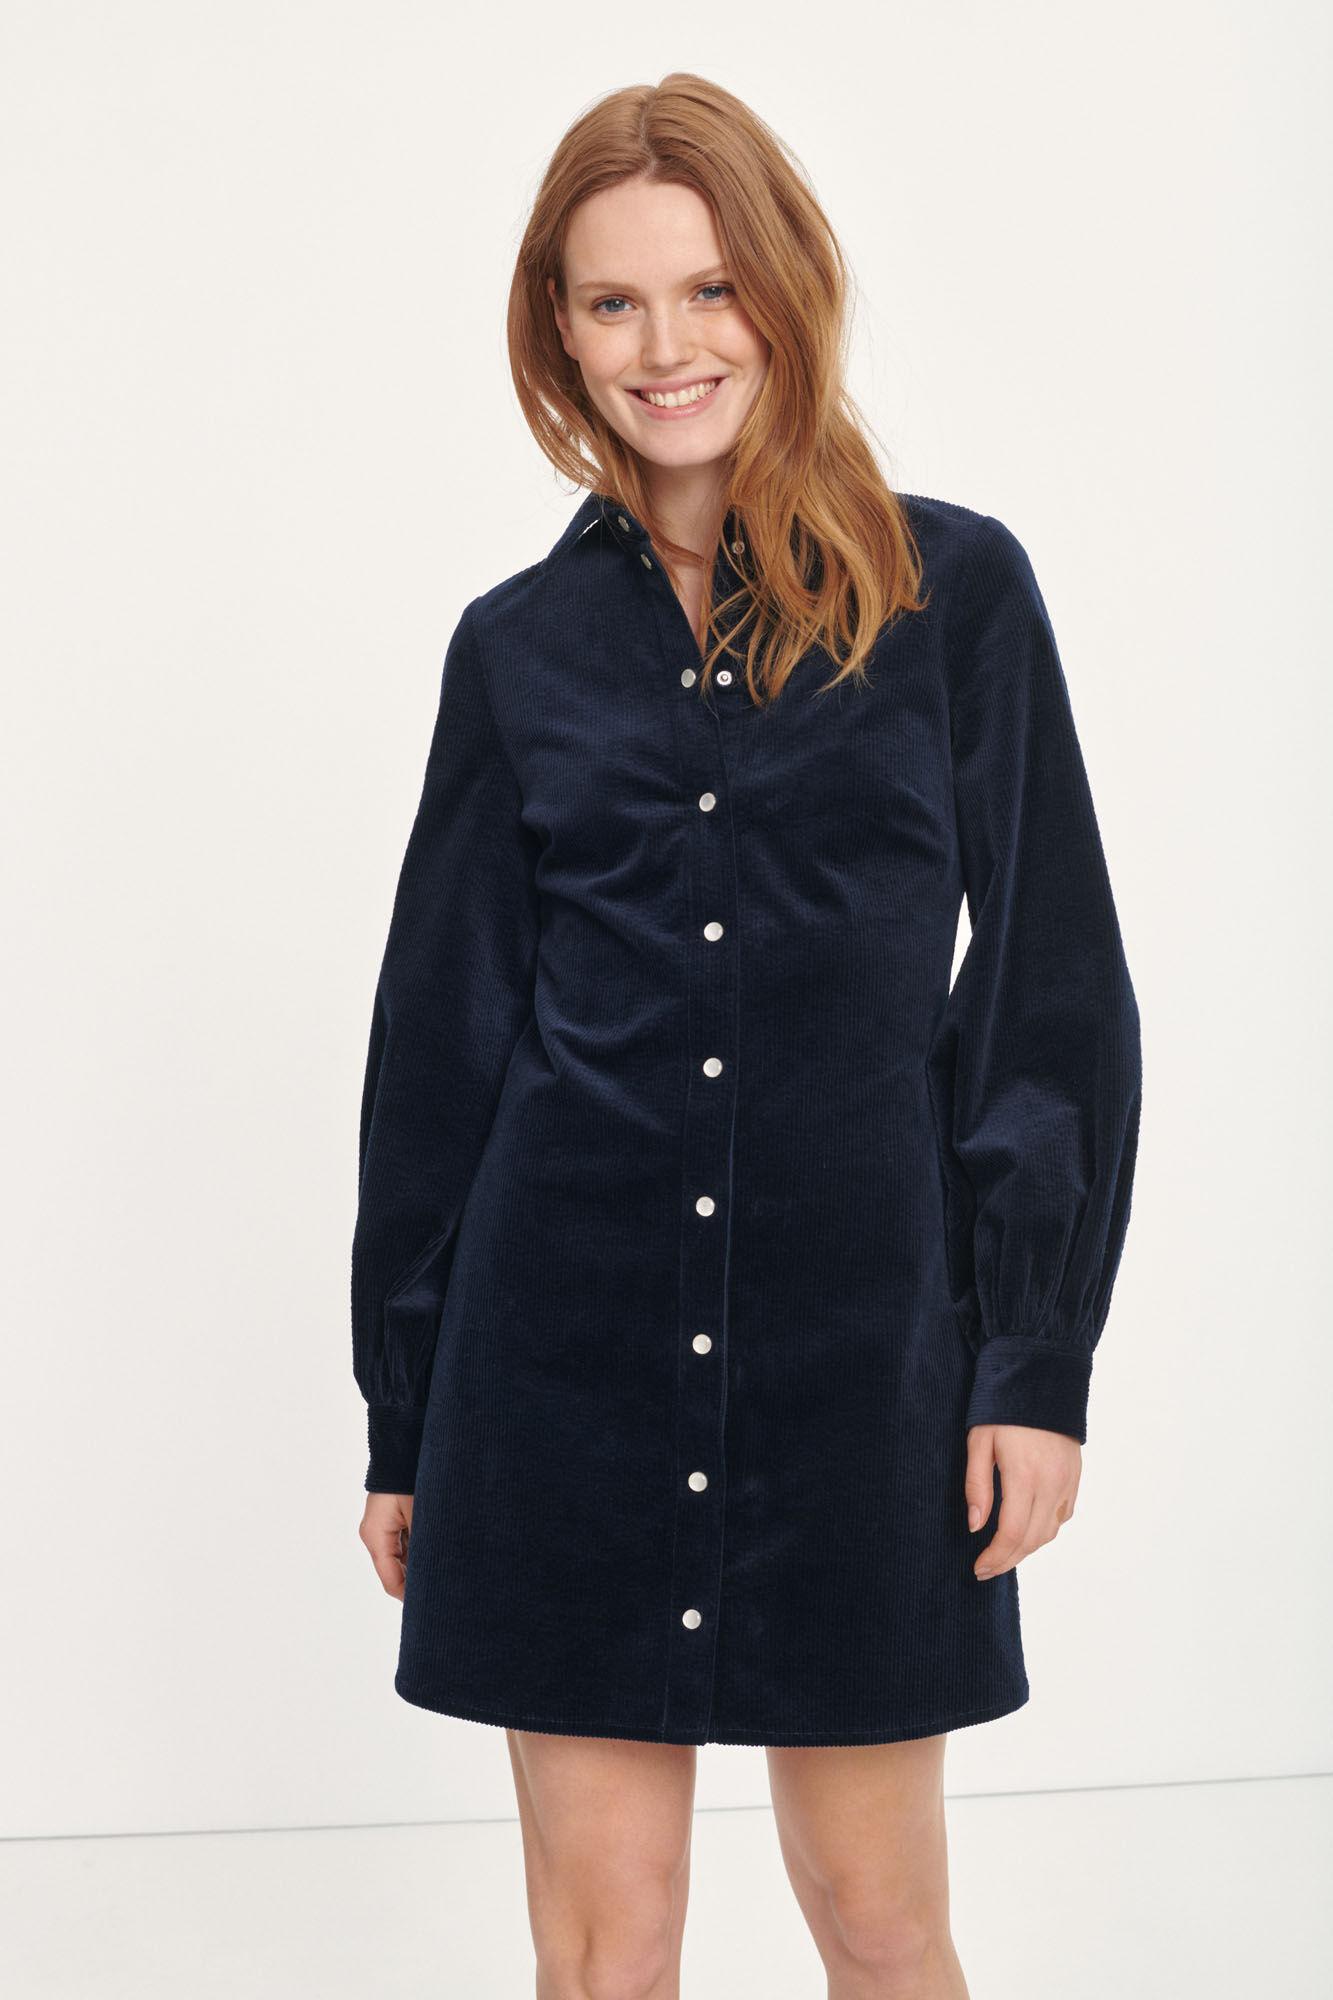 Moonstone dress 12864, SKY CAPTAIN